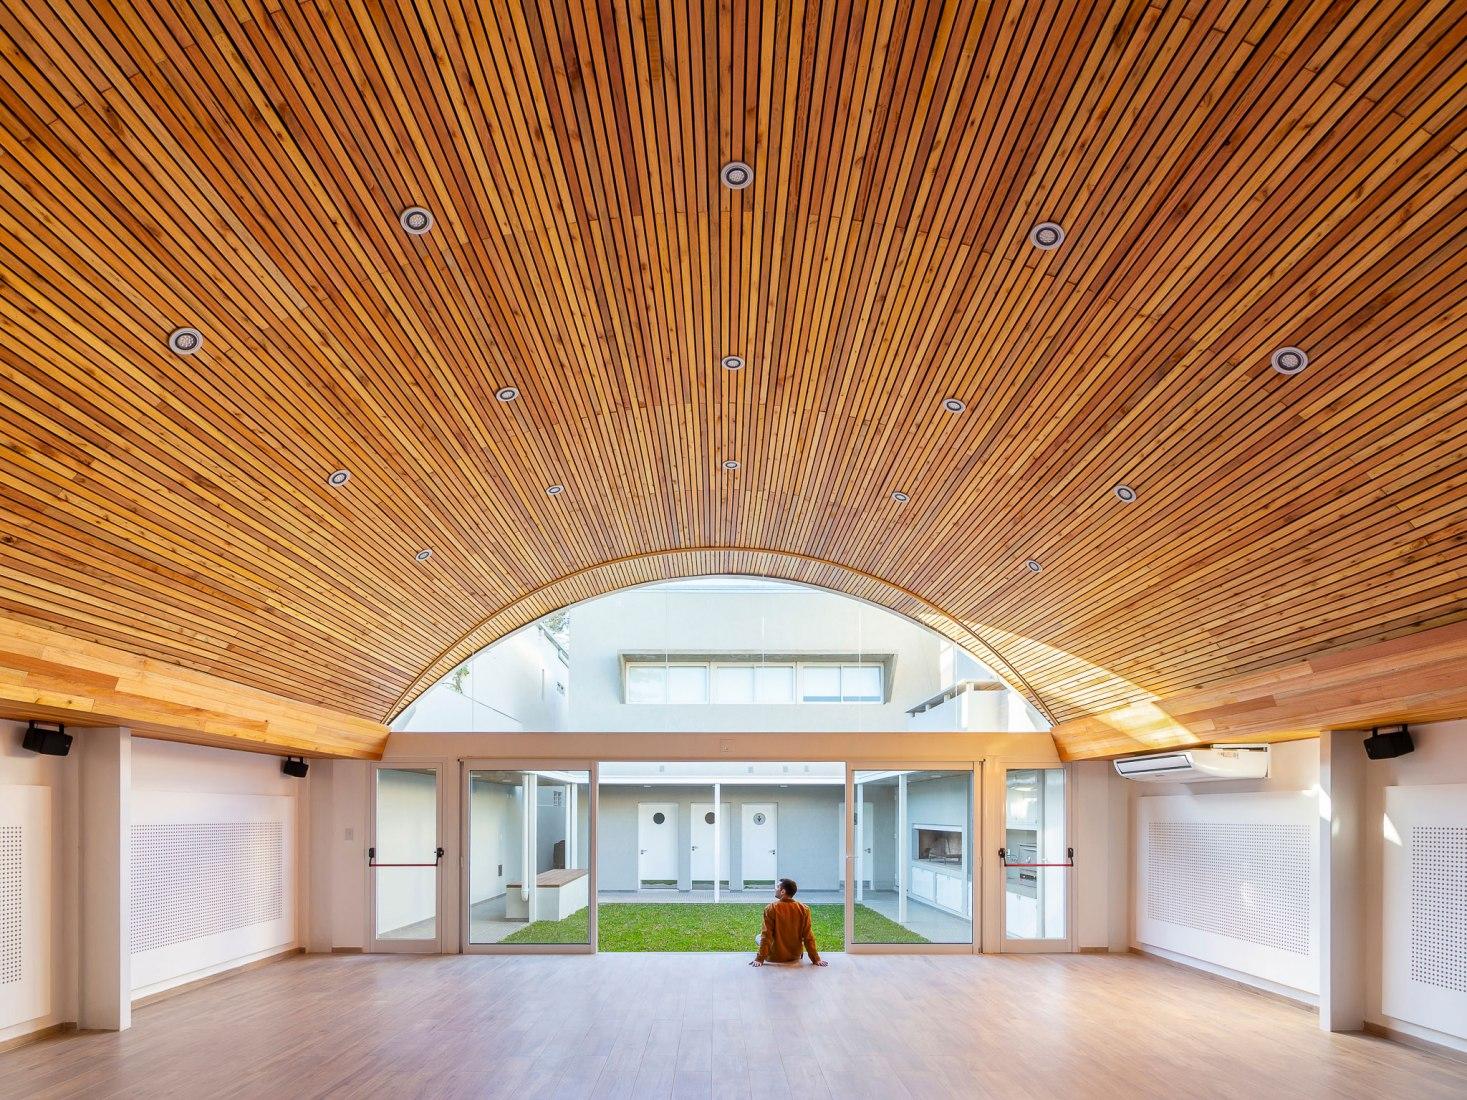 Multipurpose Hall. Santa Fe Surveyors Professional Association by Irigoyen Navarro Arquitectos. Photograph by Ramiro Sosa